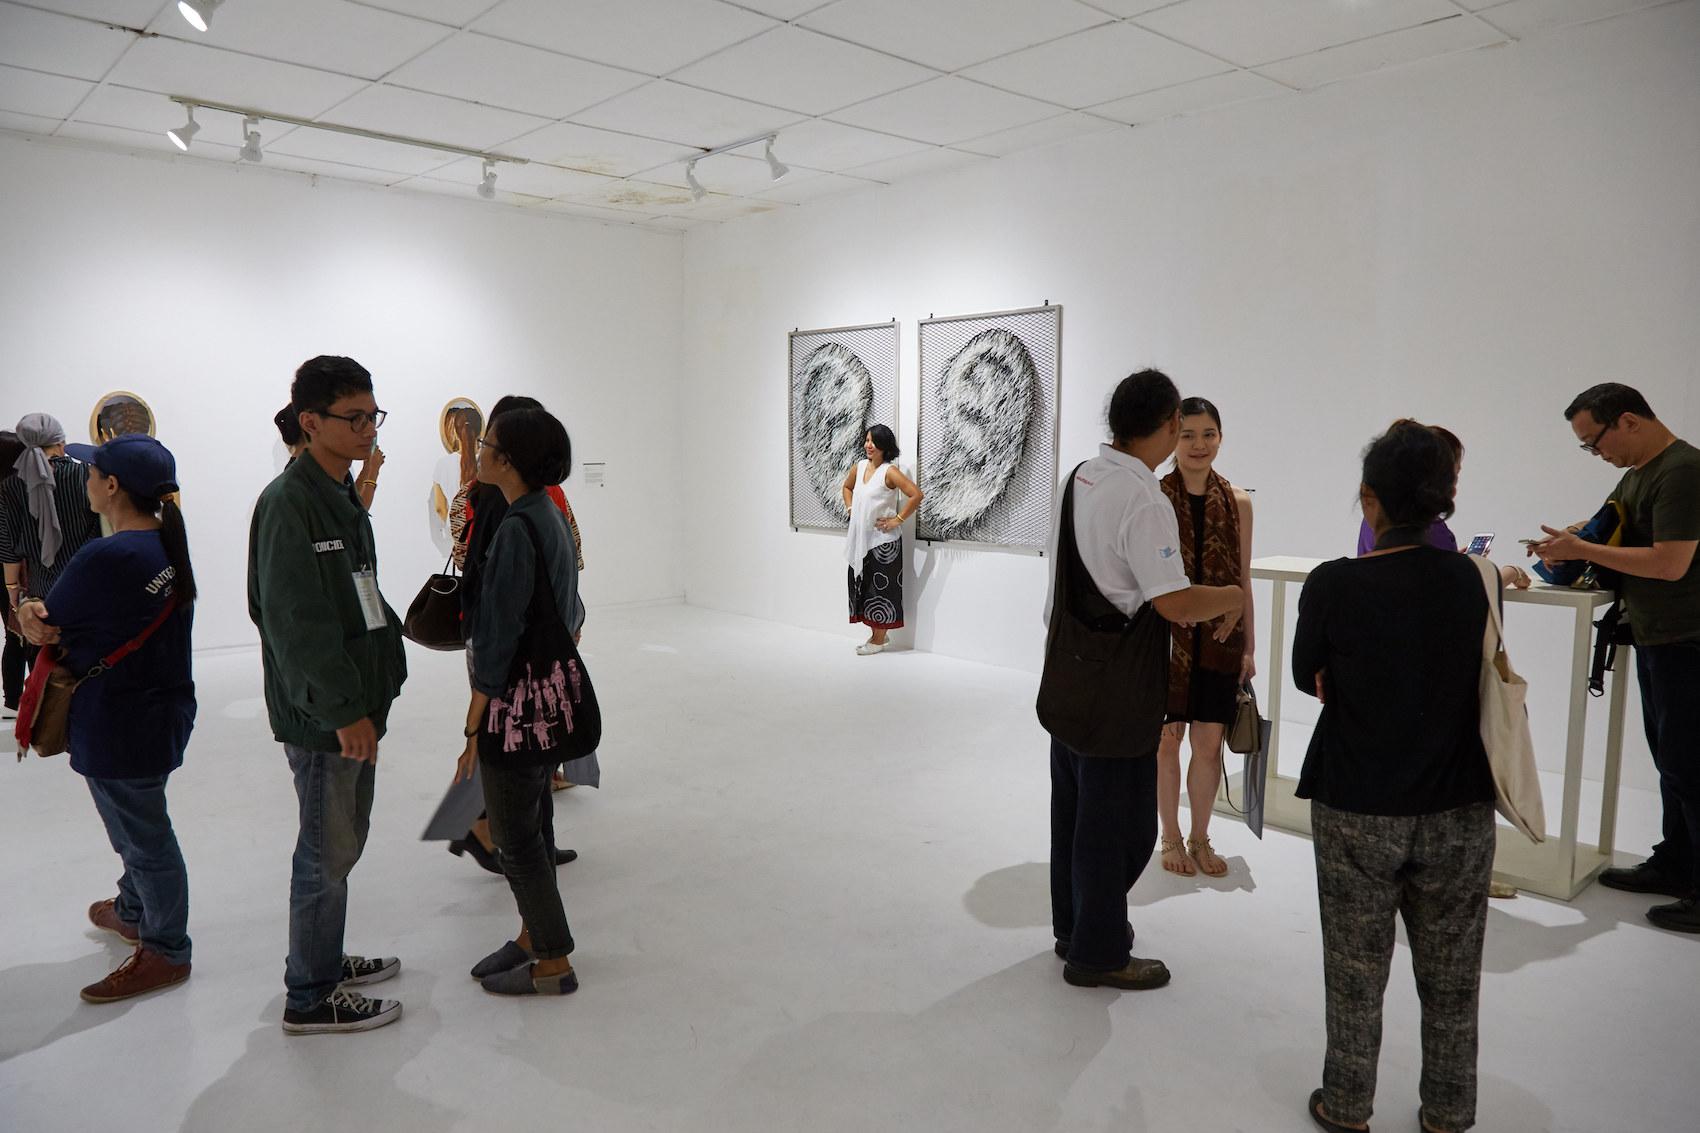 ART|JOG 10 Gallery Space